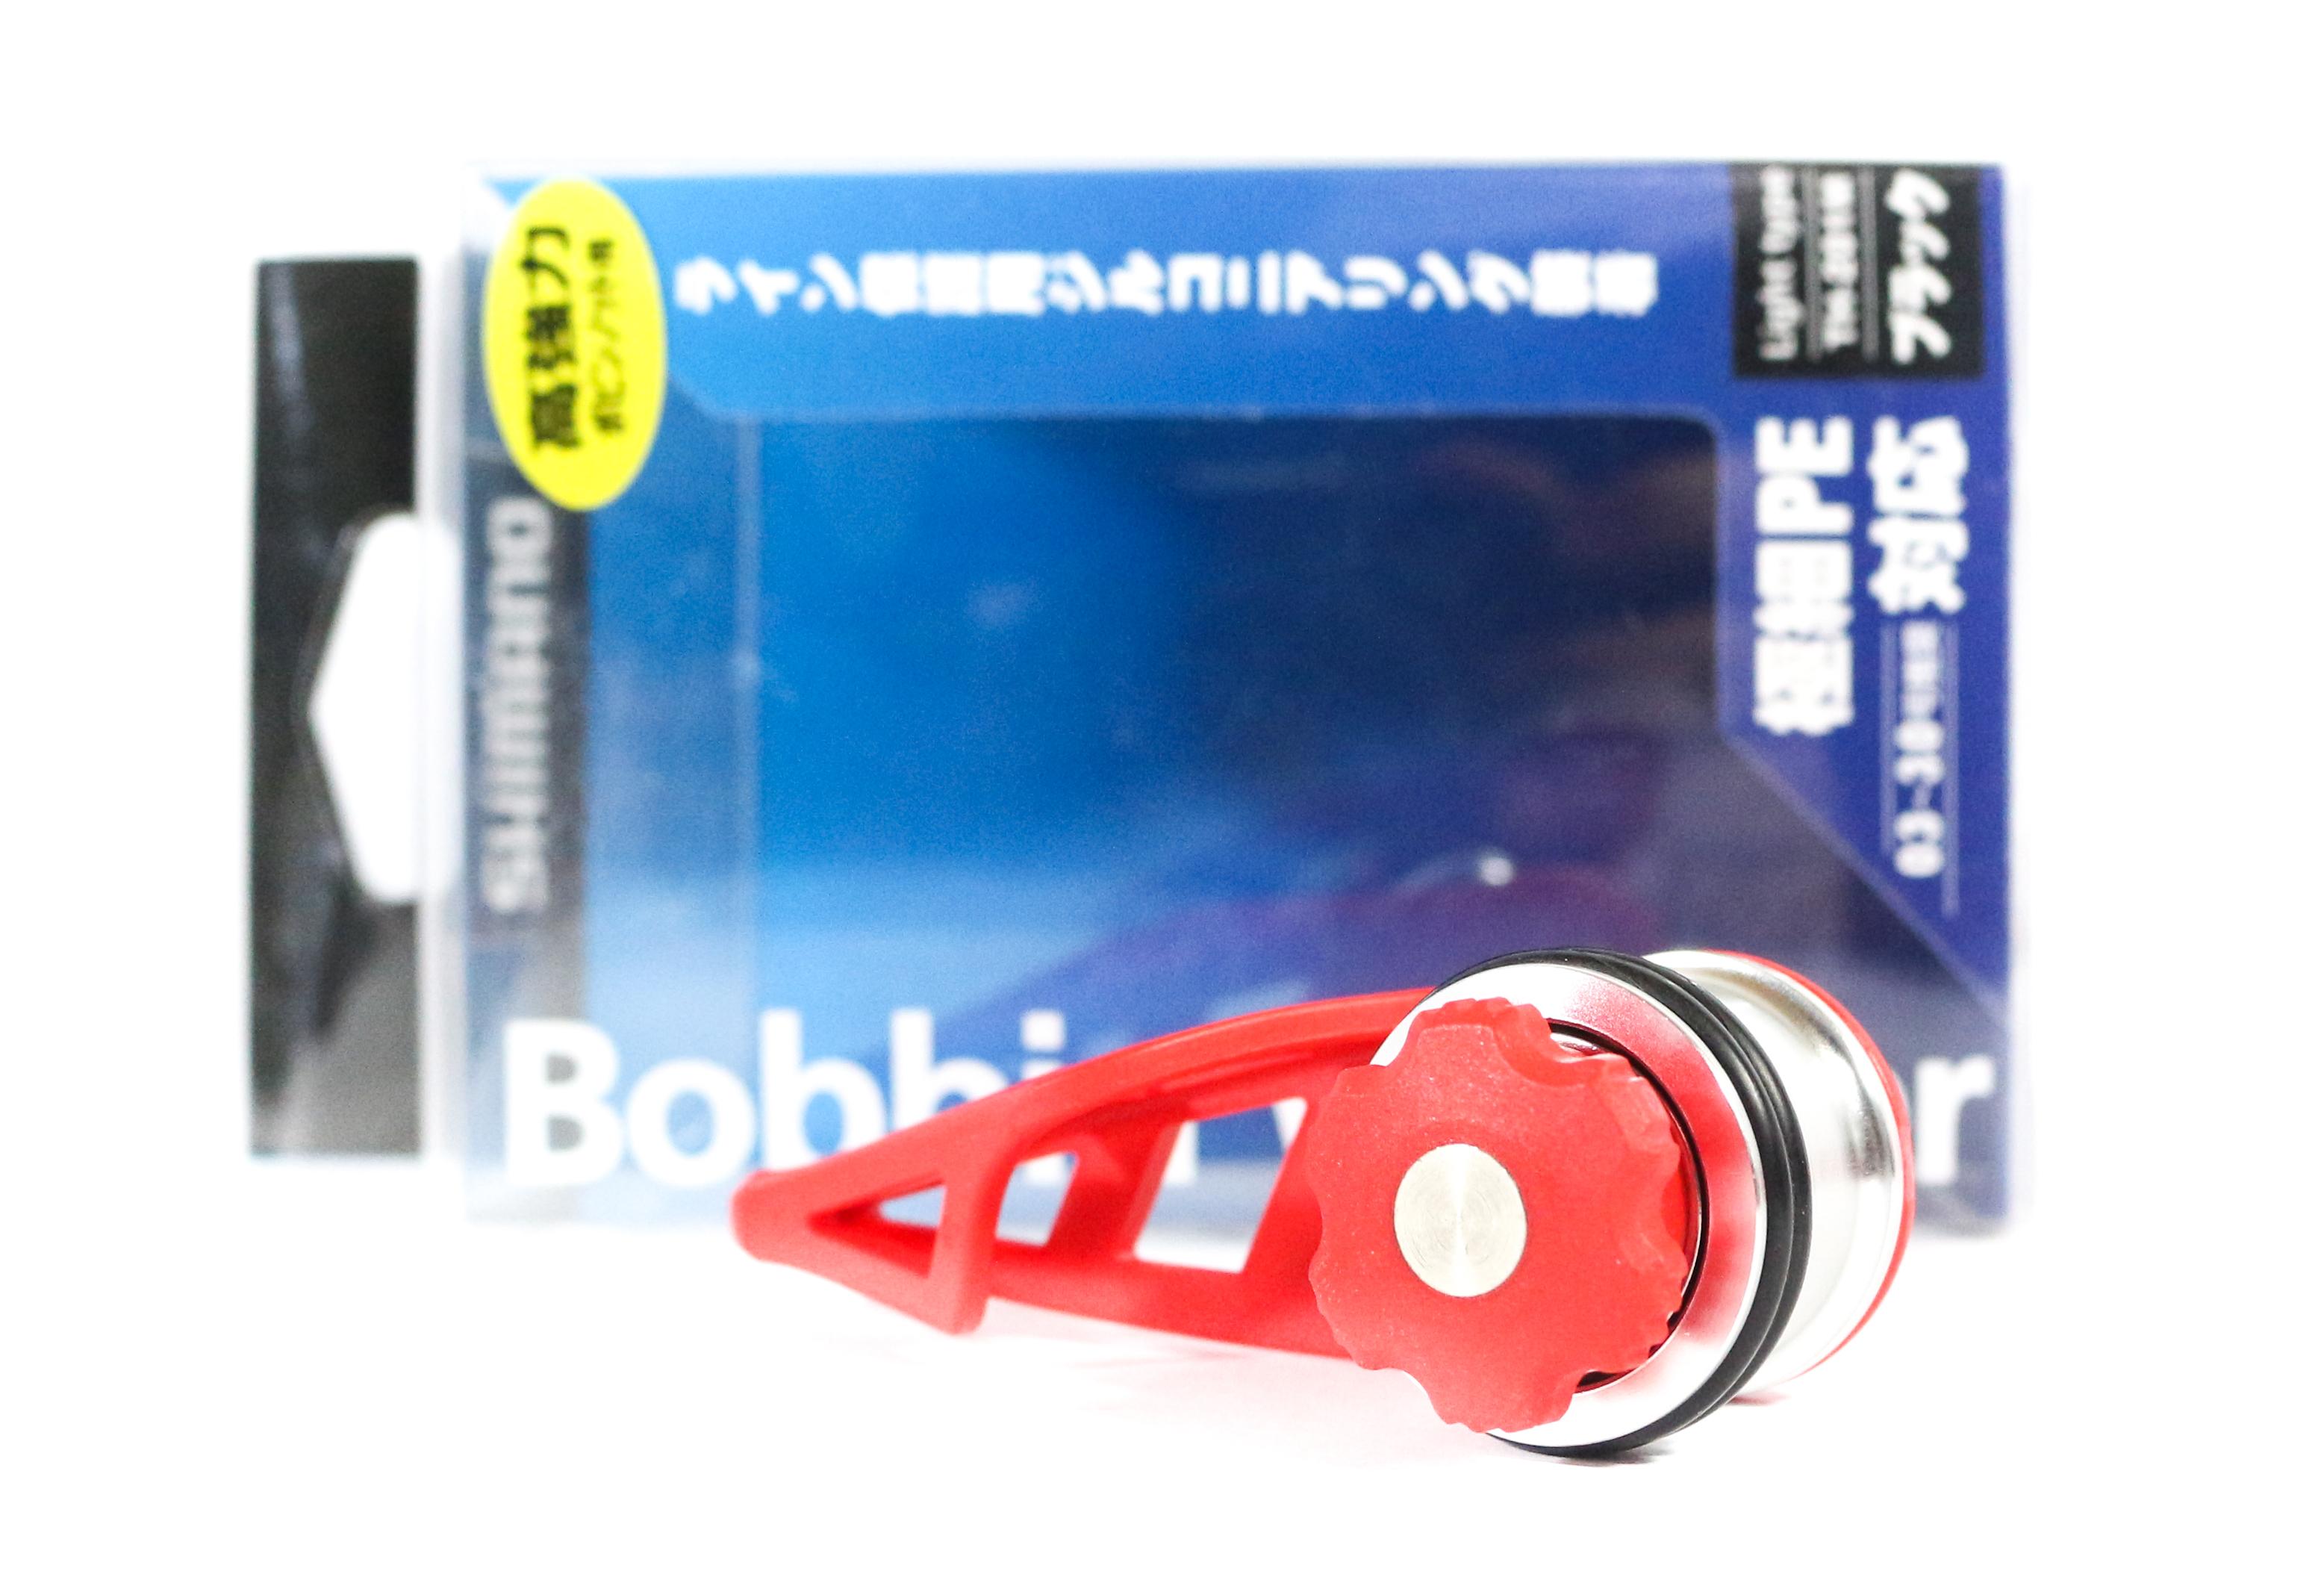 Shimano TH-201M Bobbin Knotter Knot Machine Light P.E 0.3 - 3 Orange 410436